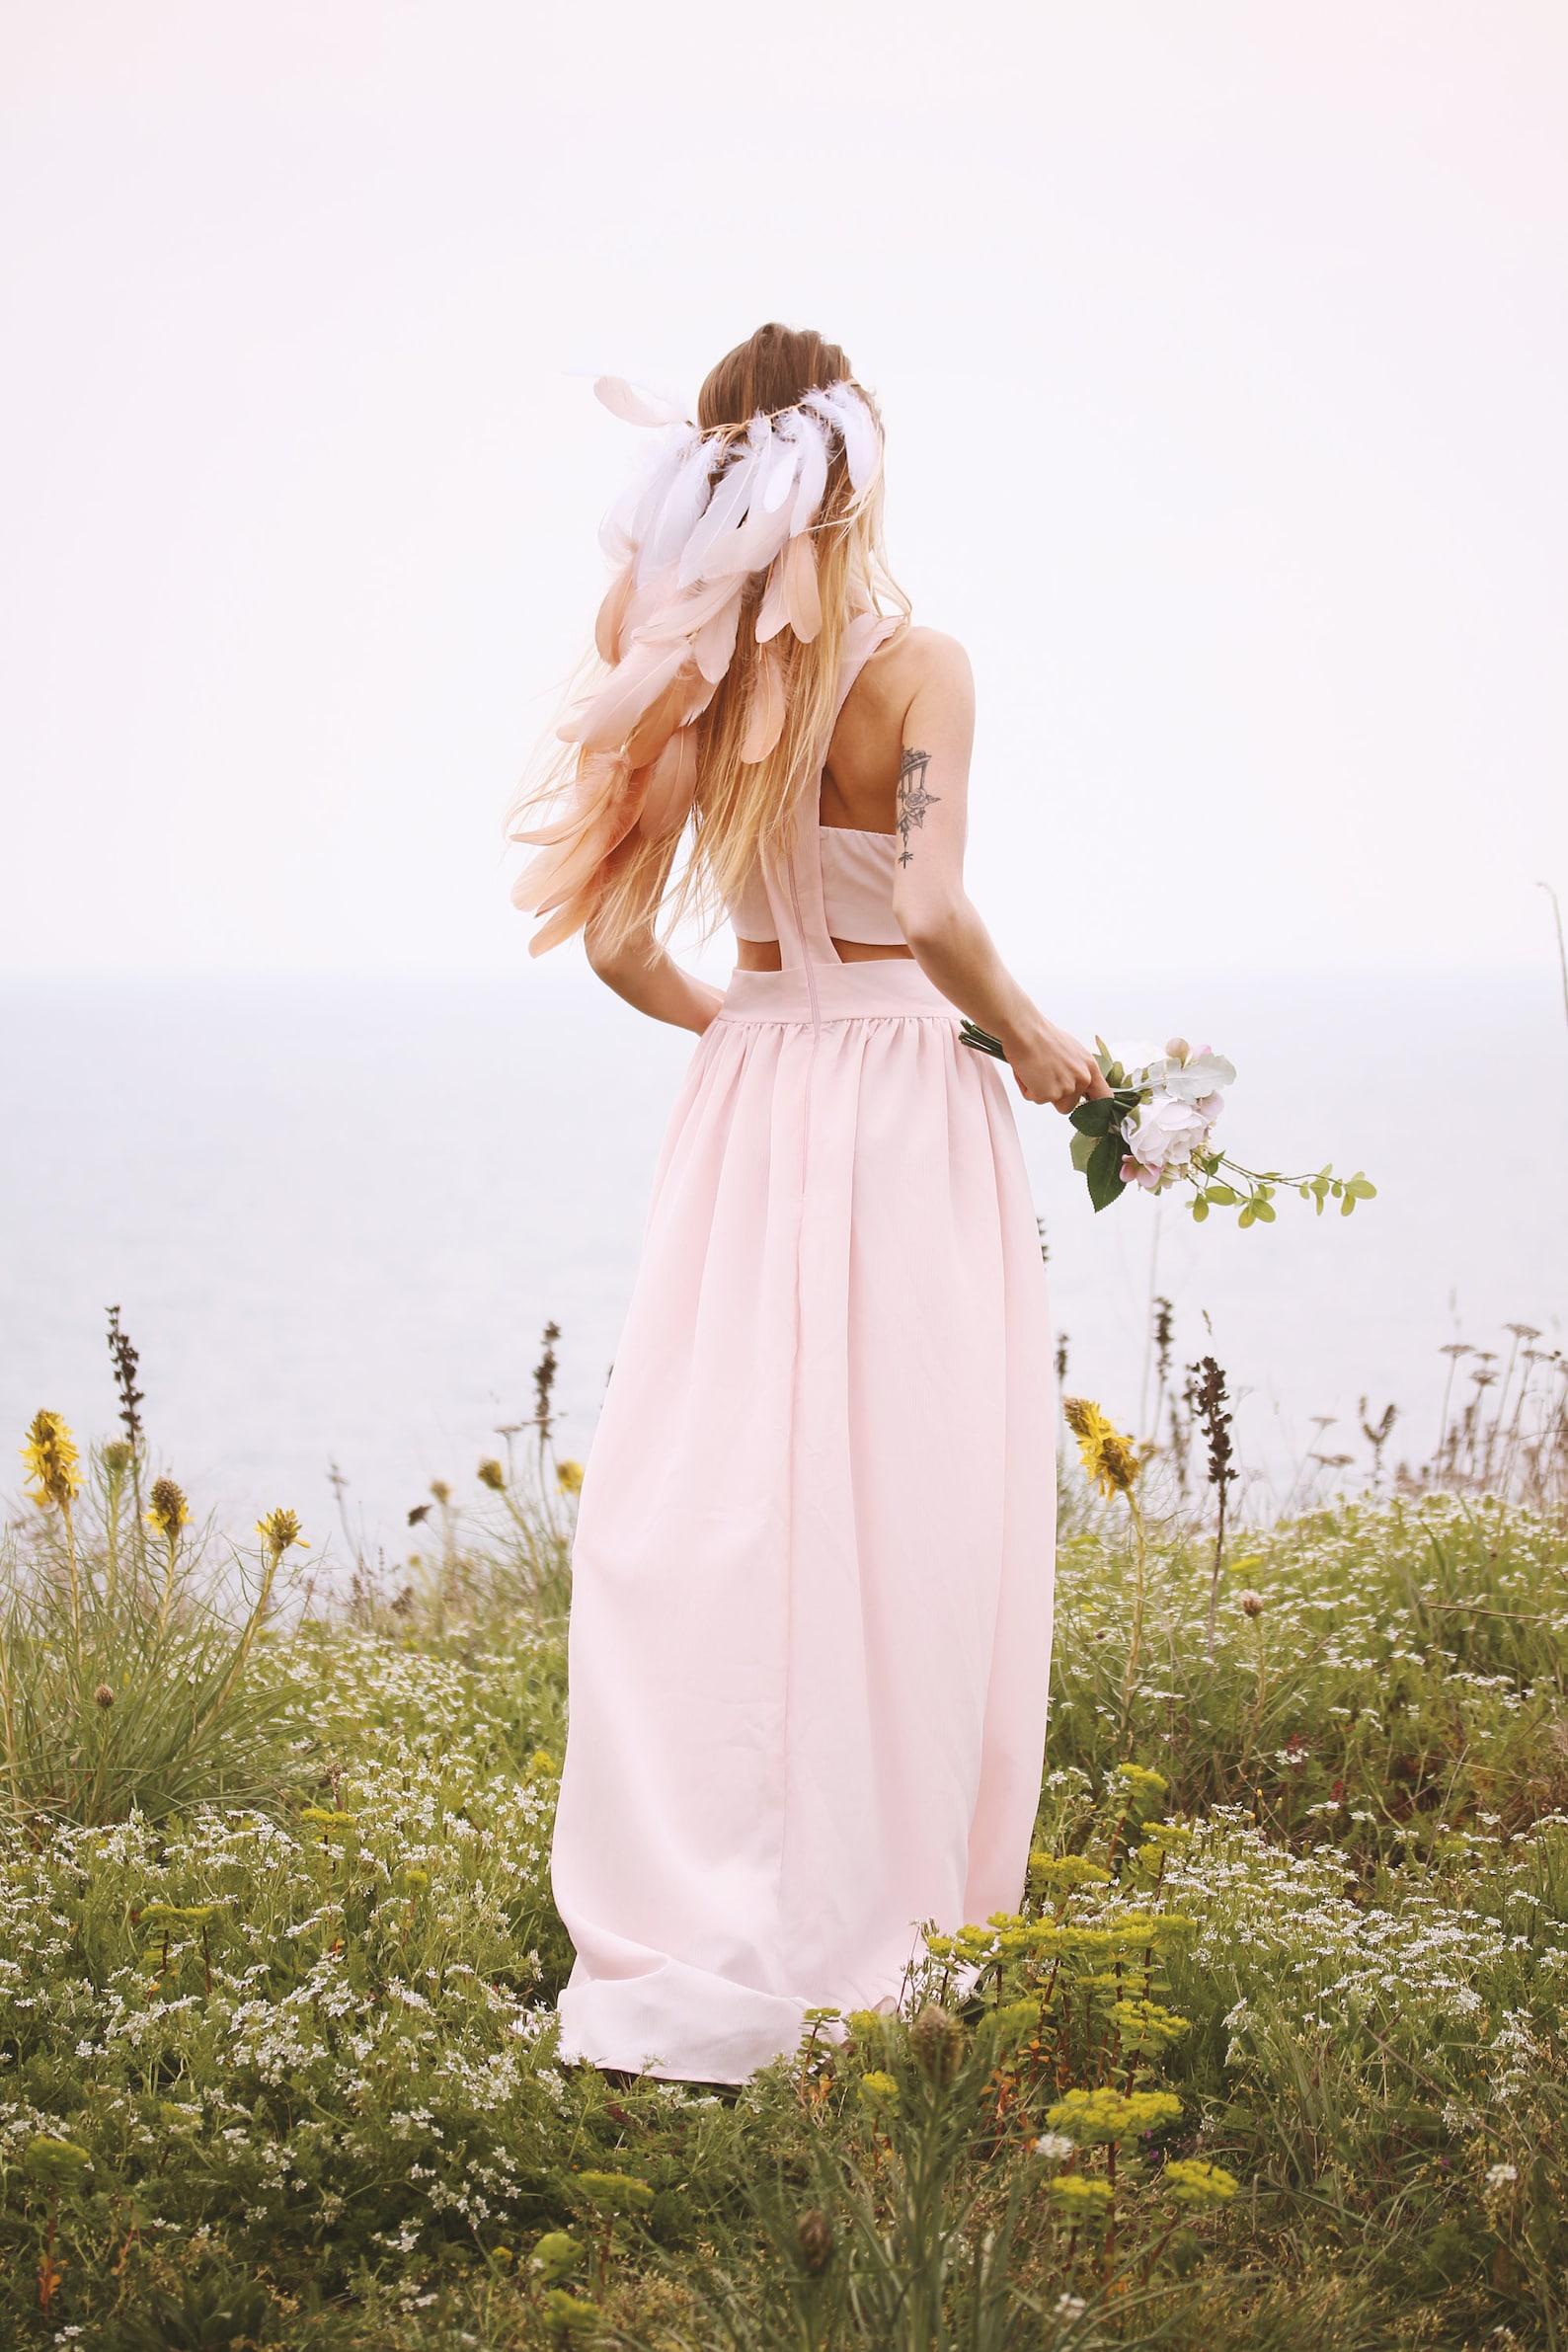 Wedding Hair Accessories Ideas for Boho Chic Brides, White & Beige Feather Boho-Chic Headband